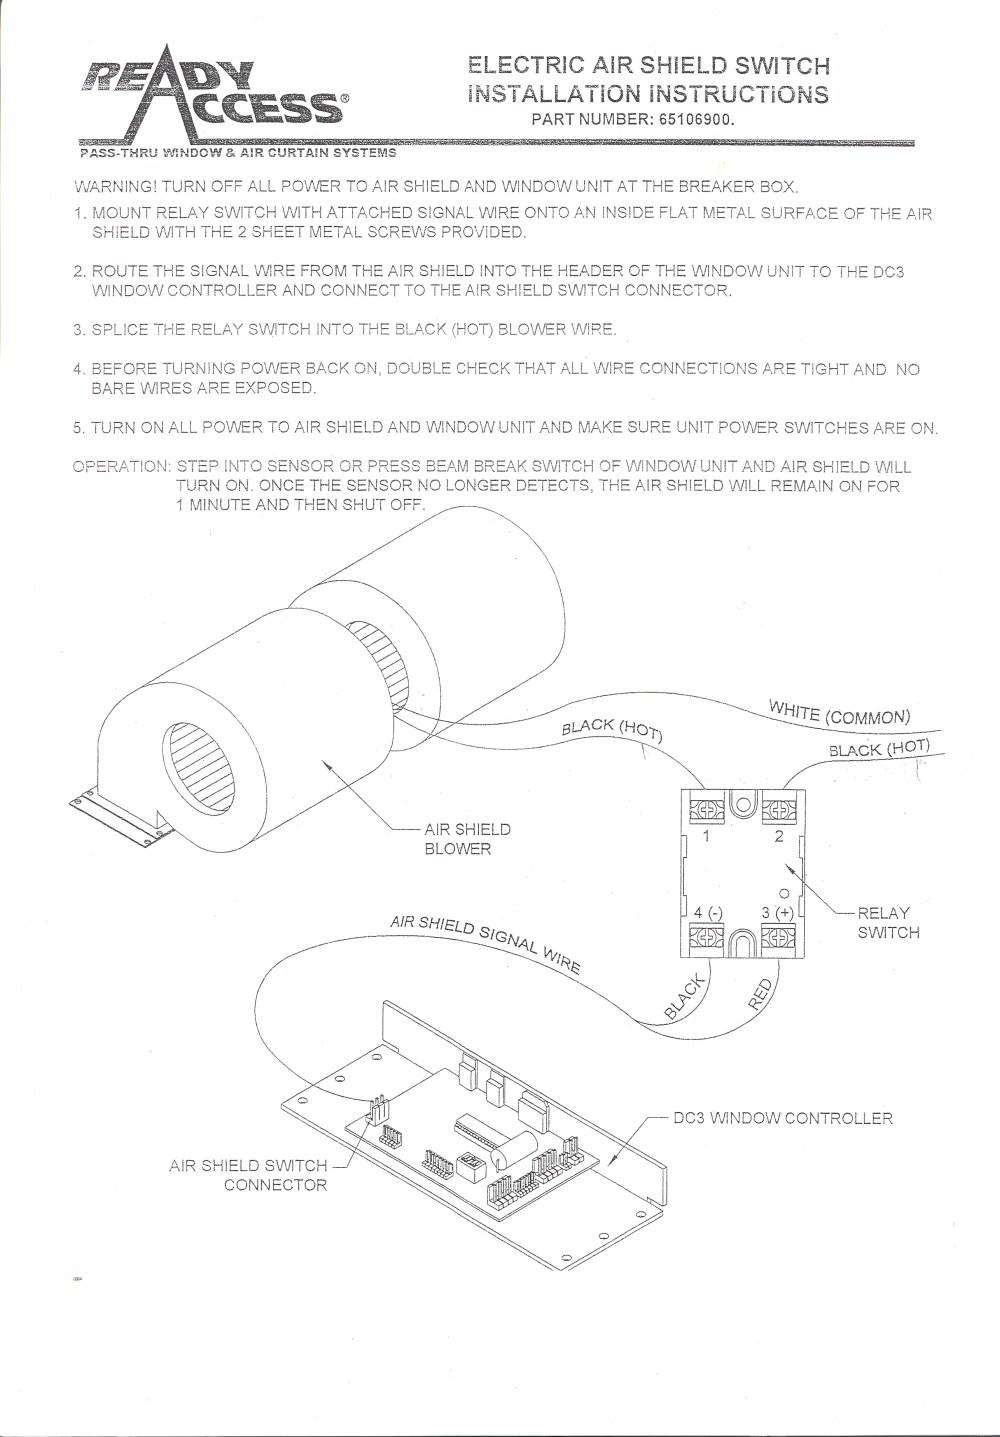 medium resolution of fly fan switch electric window installation